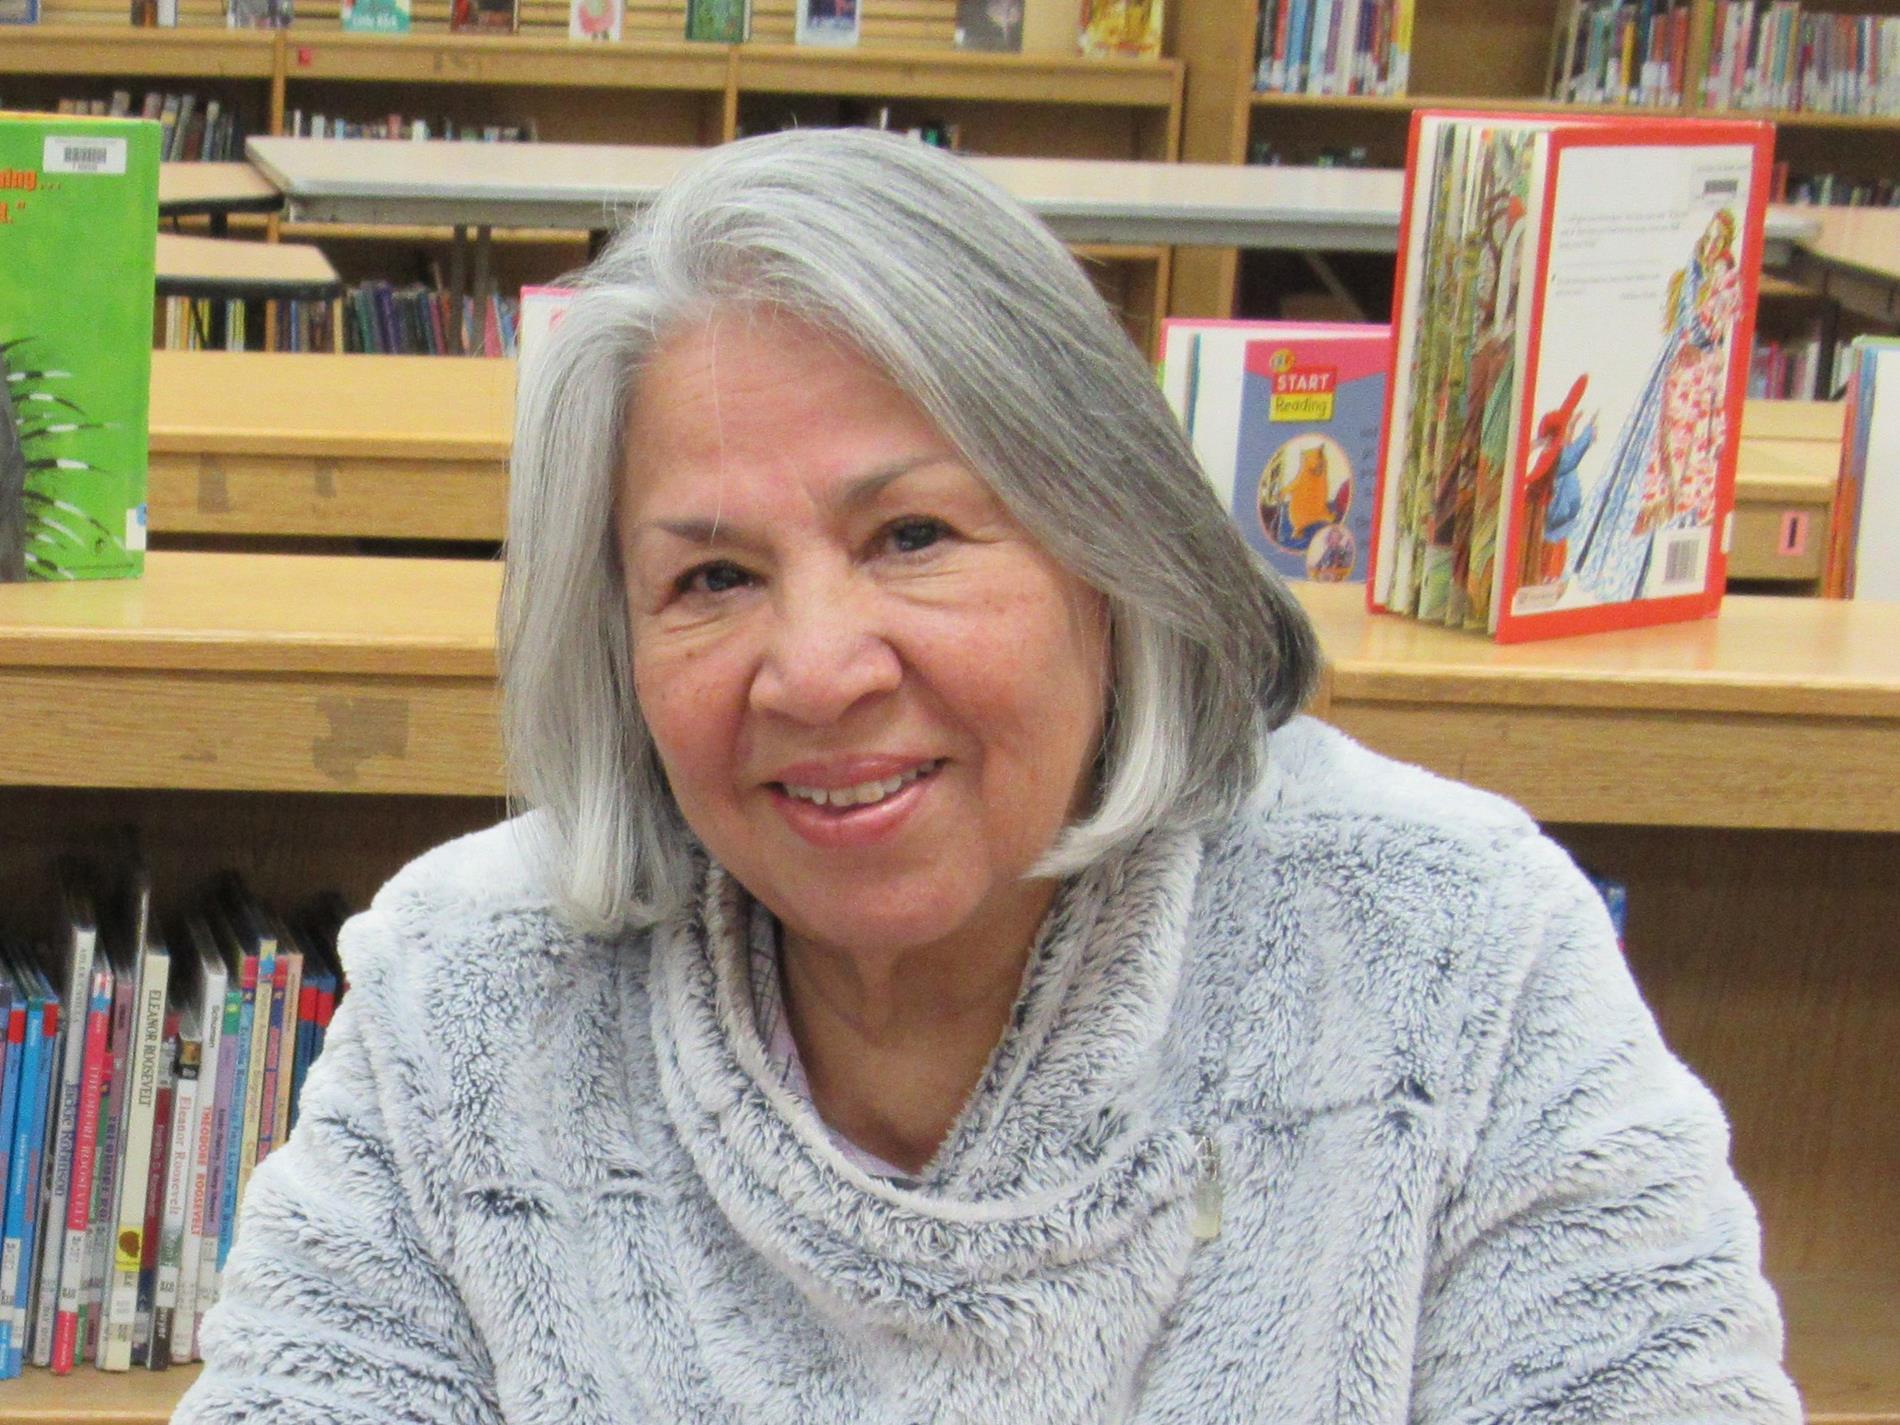 Mrs. Yolanda Gonzalez